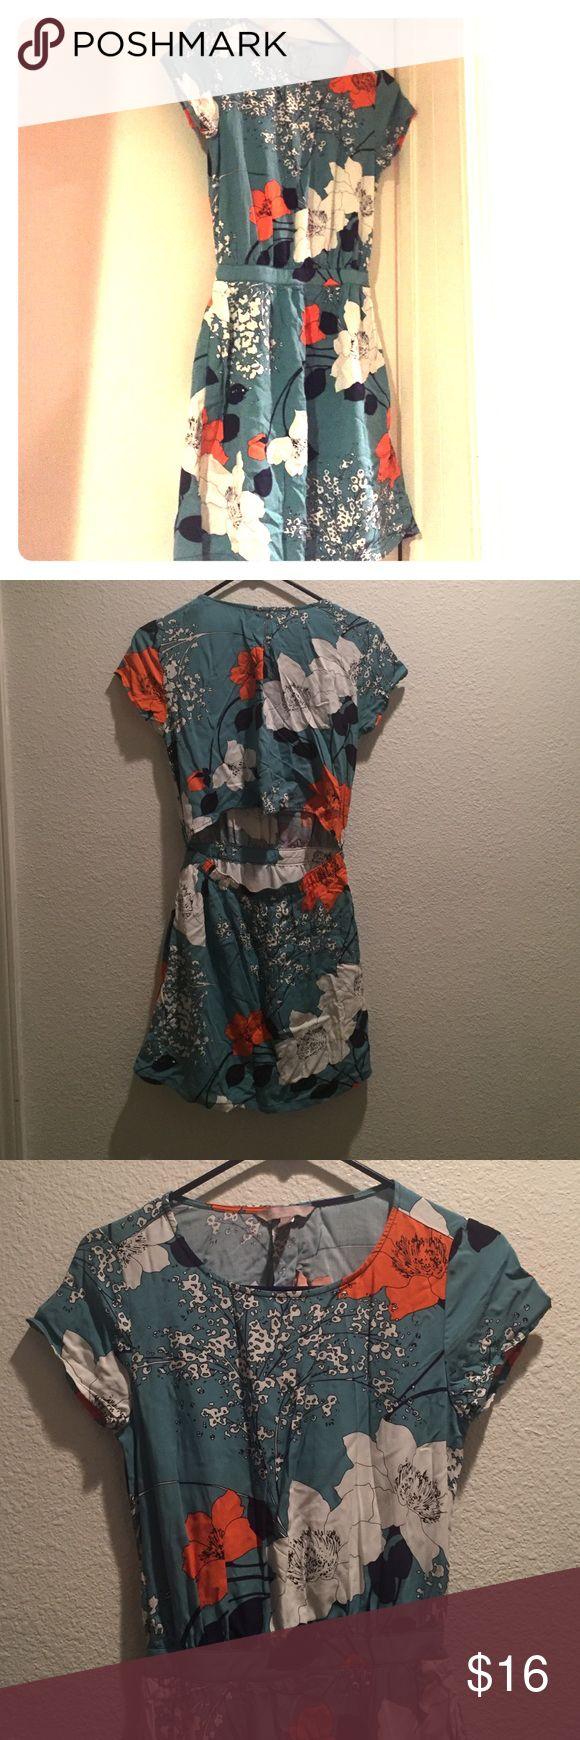 Teal floral dress Has an open back cut. It is a little wrinkled. Petite size 00 Banana Republic Dresses Mini